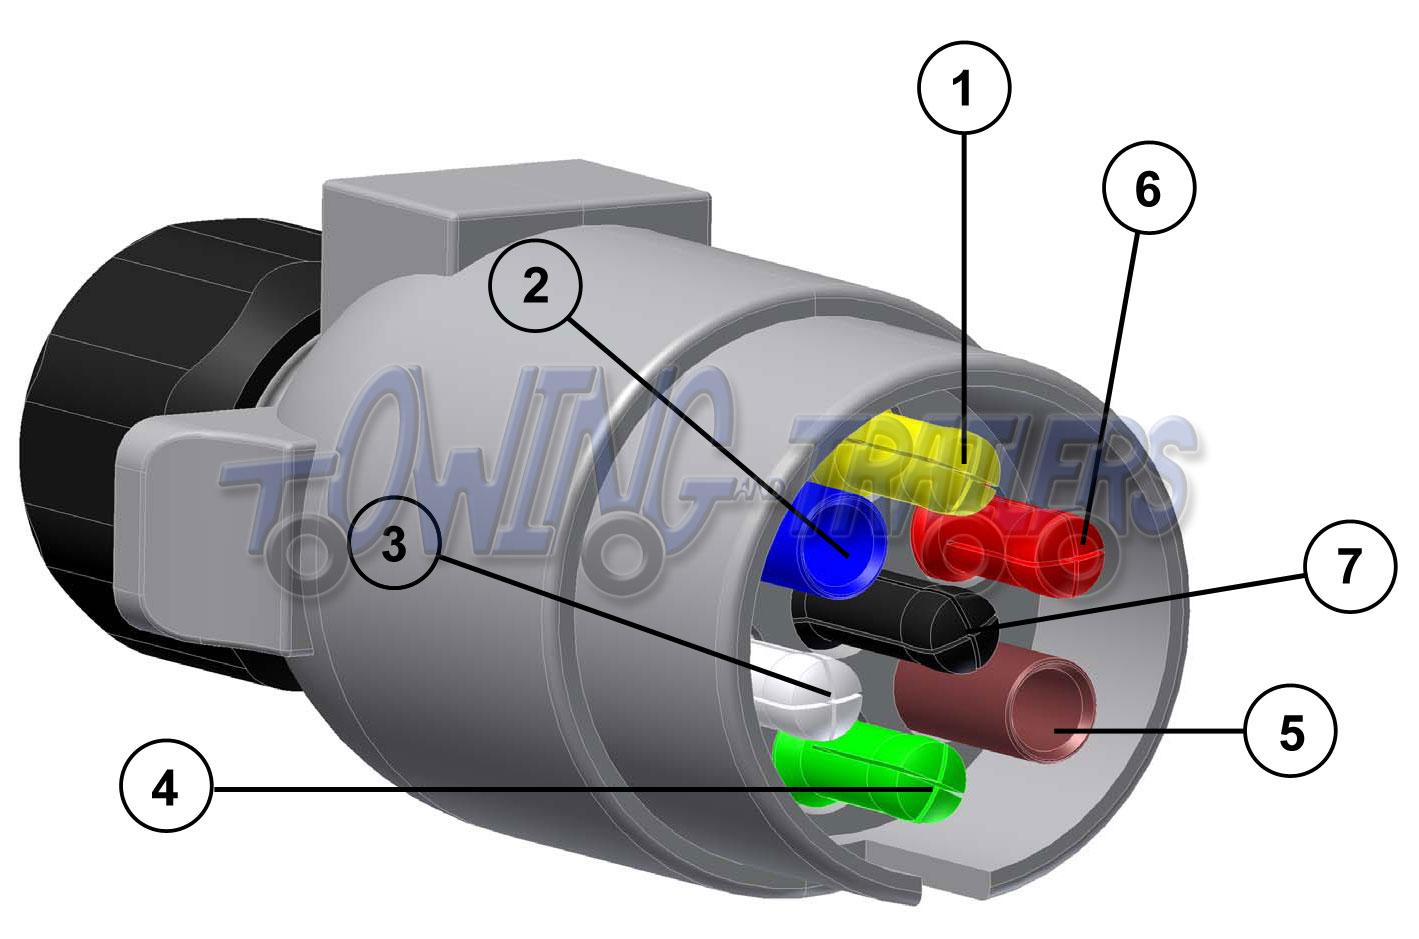 12n Trailer Plug Wiring Diagram 31 Images Help Needed Ukcampsitecouk Caravans And Caravanning Forum Socket Diagrams Efcaviation Com 7 Pin S Type Caravan Diagramresized6652c4406ssld1